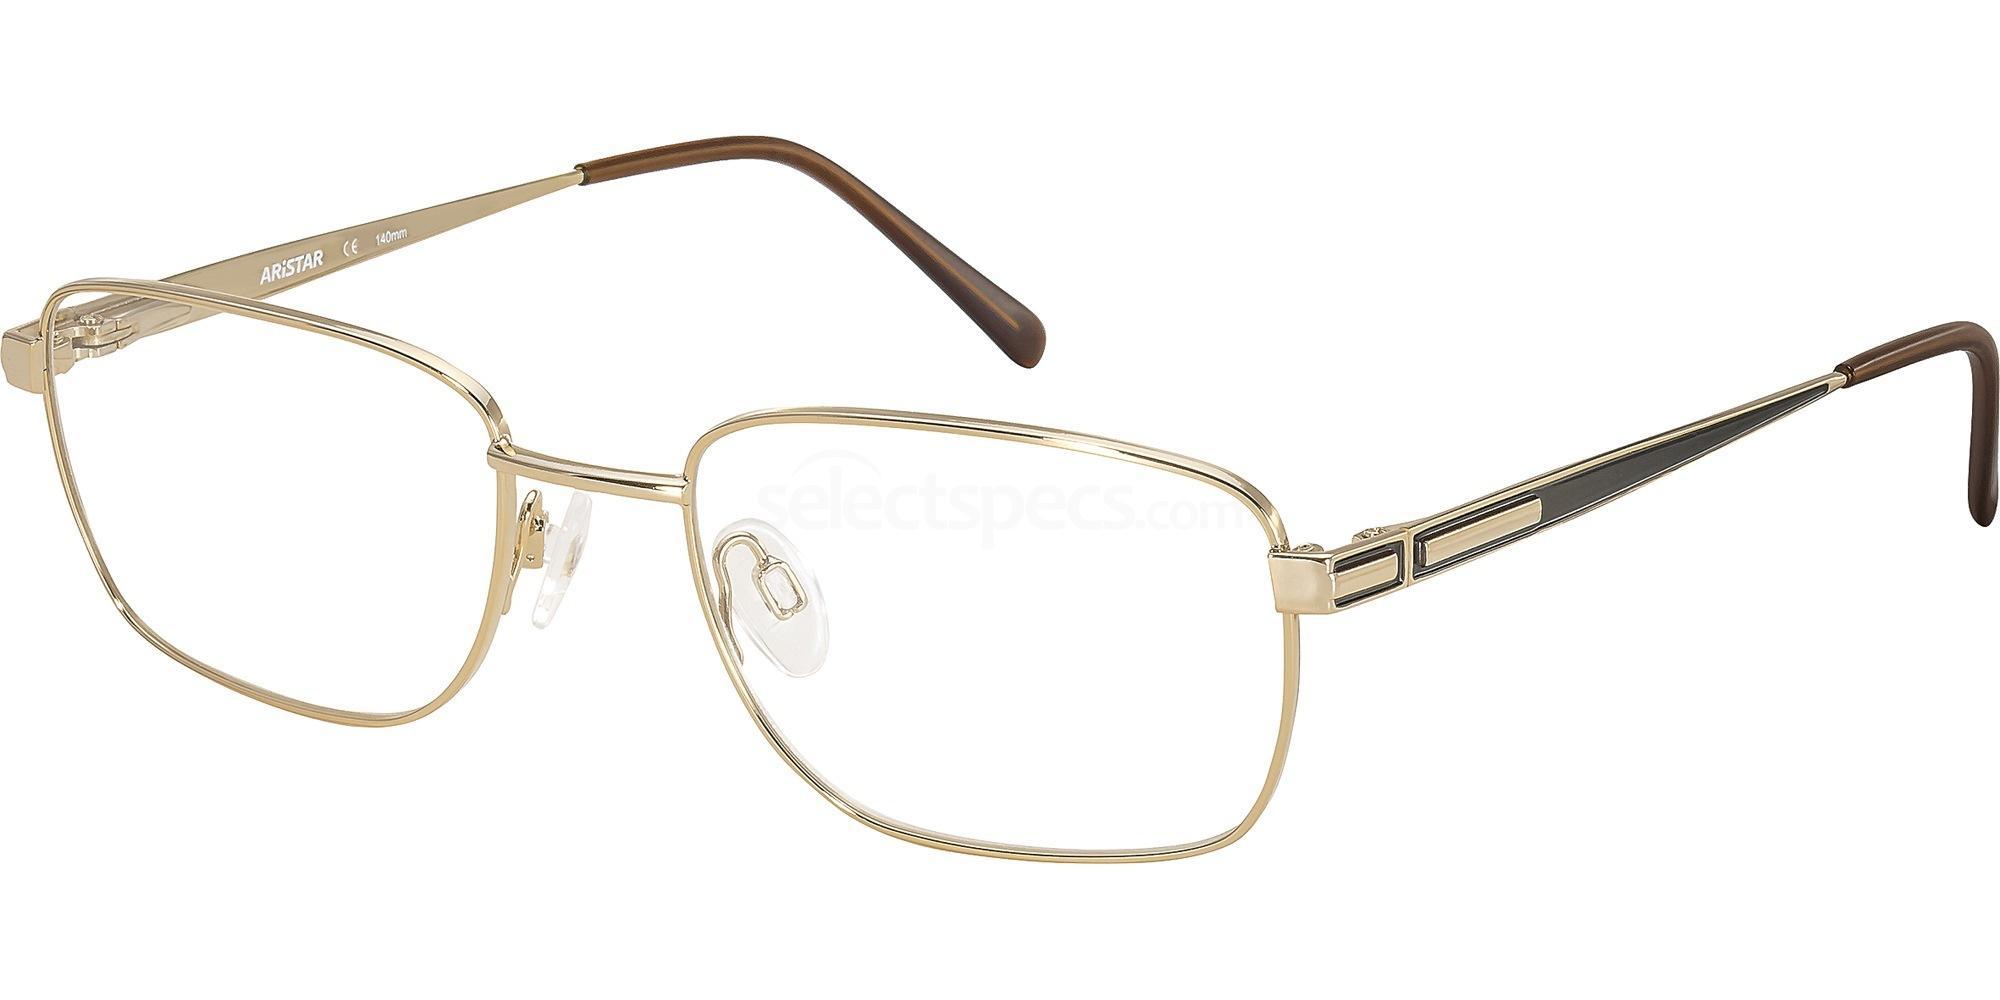 501 AR16220 Glasses, Aristar